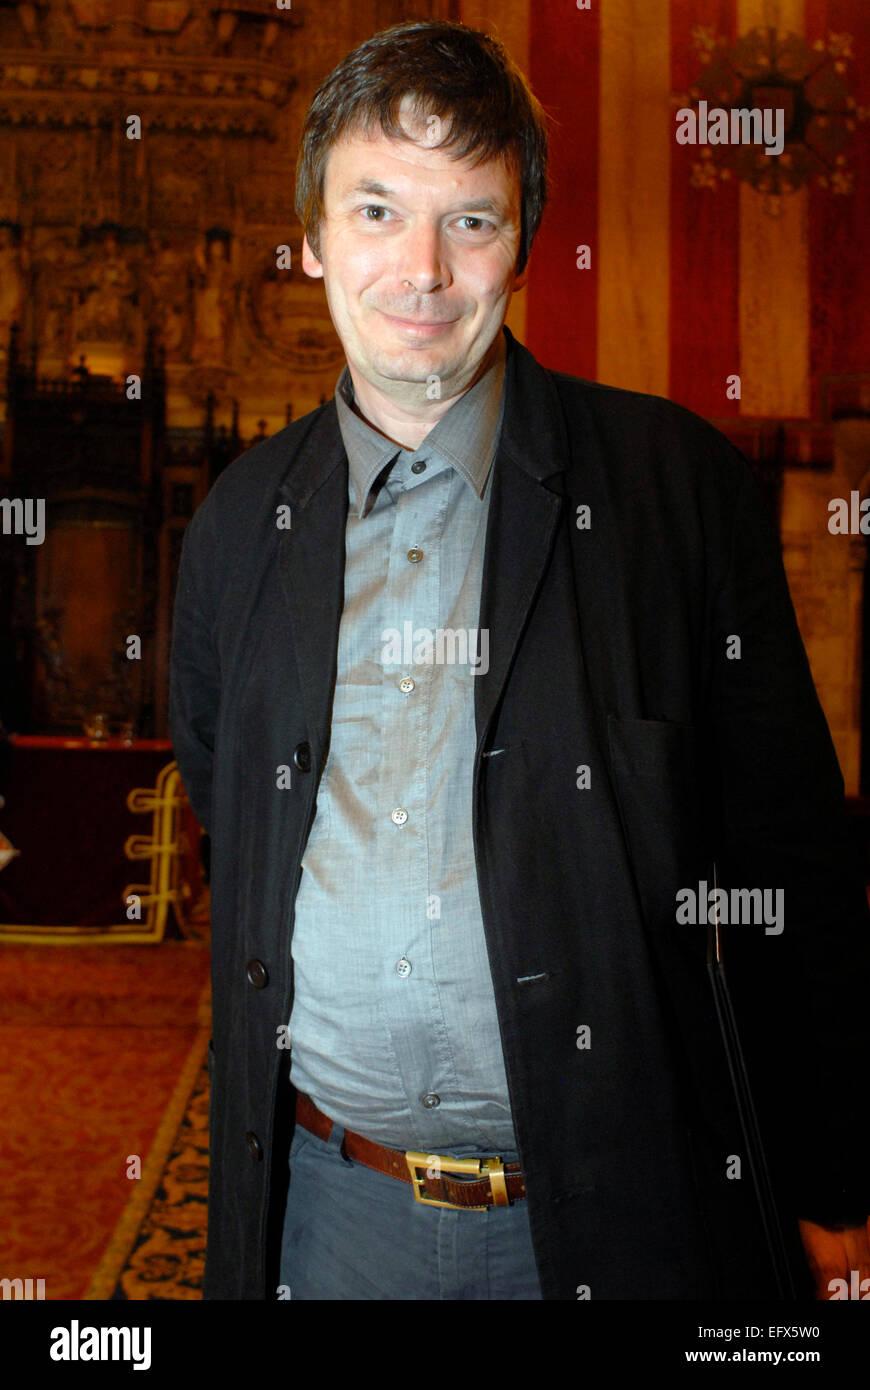 Portrait, Ian Rankin, Scottish, British Author and Writer, Prize in Barcelona. - Stock Image